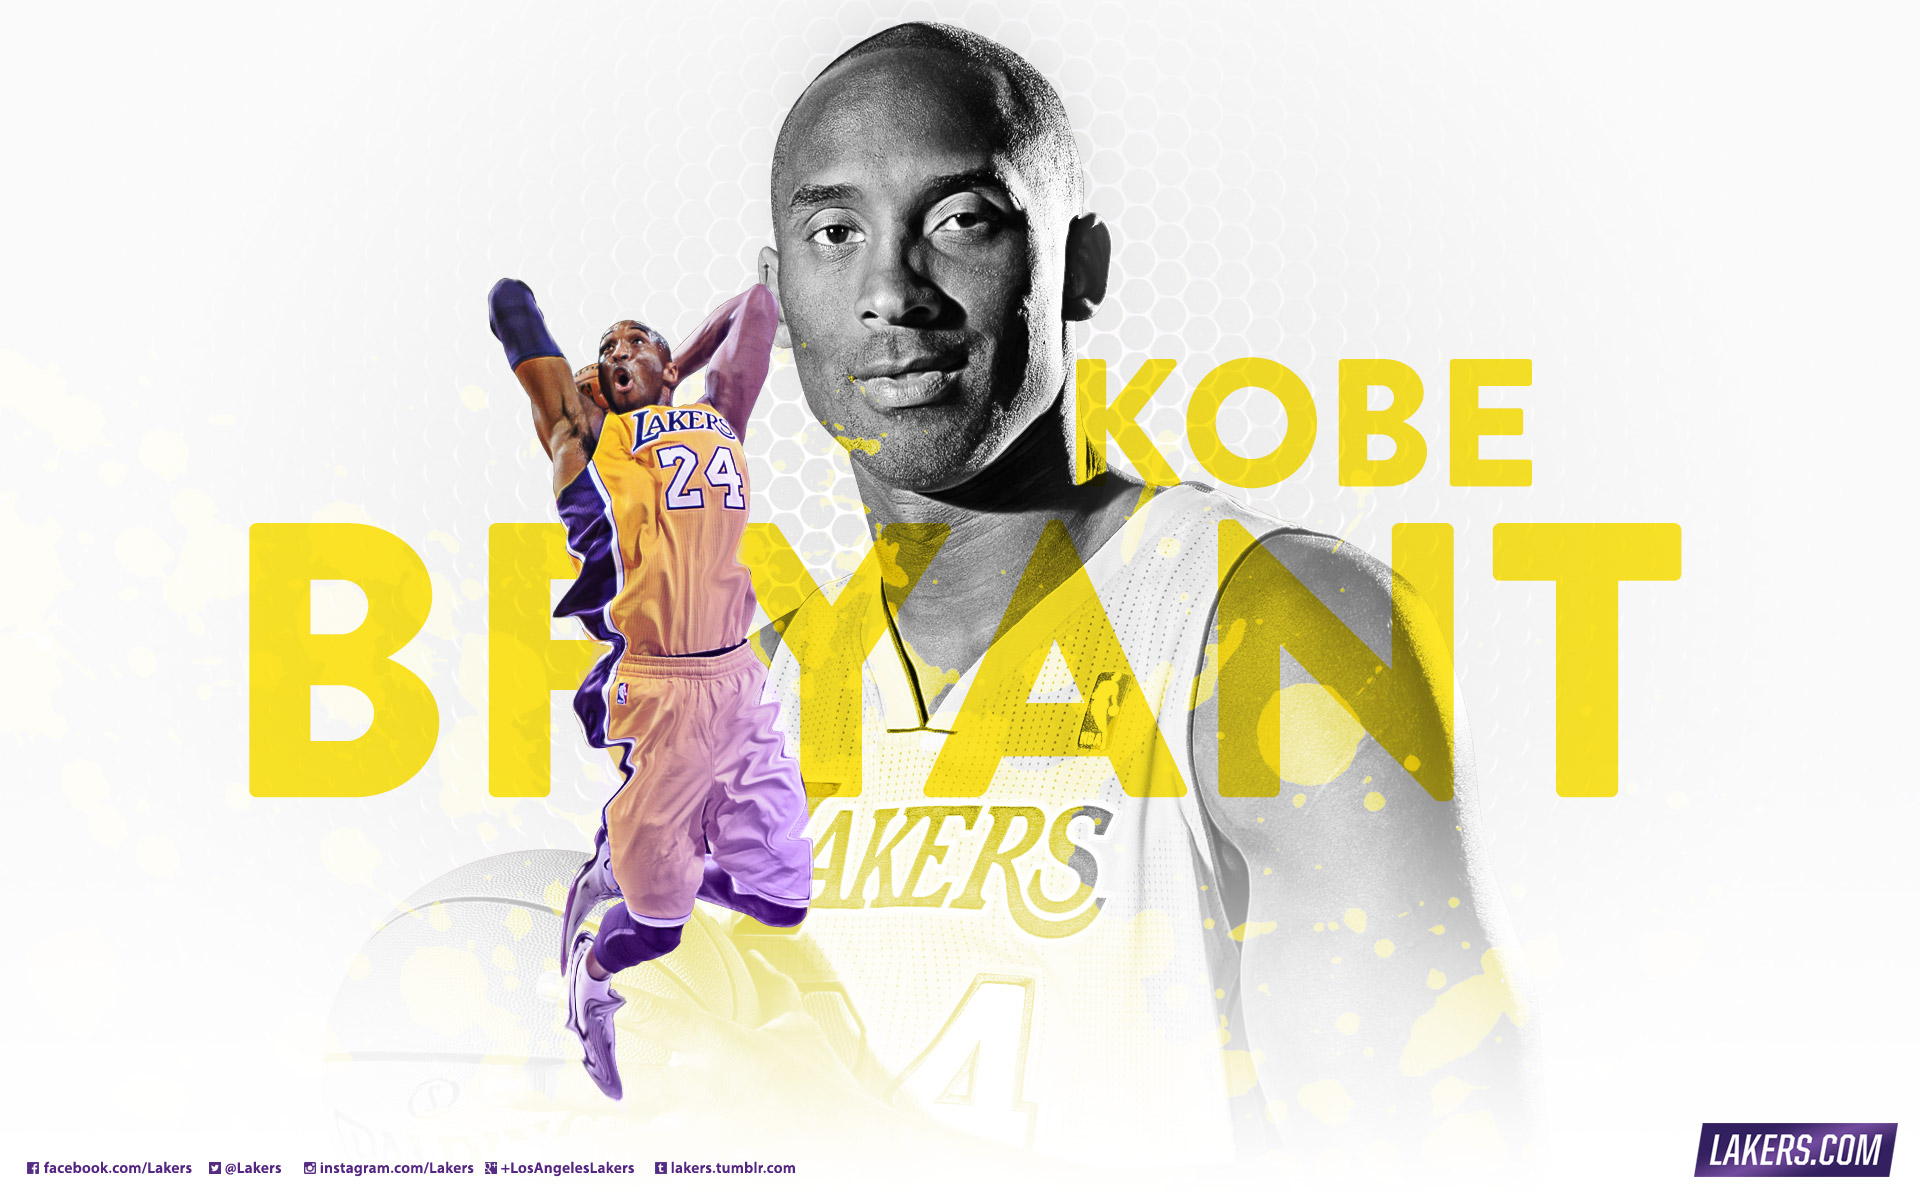 kobe bryant desktop wallpapers 2014 Desktop Backgrounds for HD 1920x1200